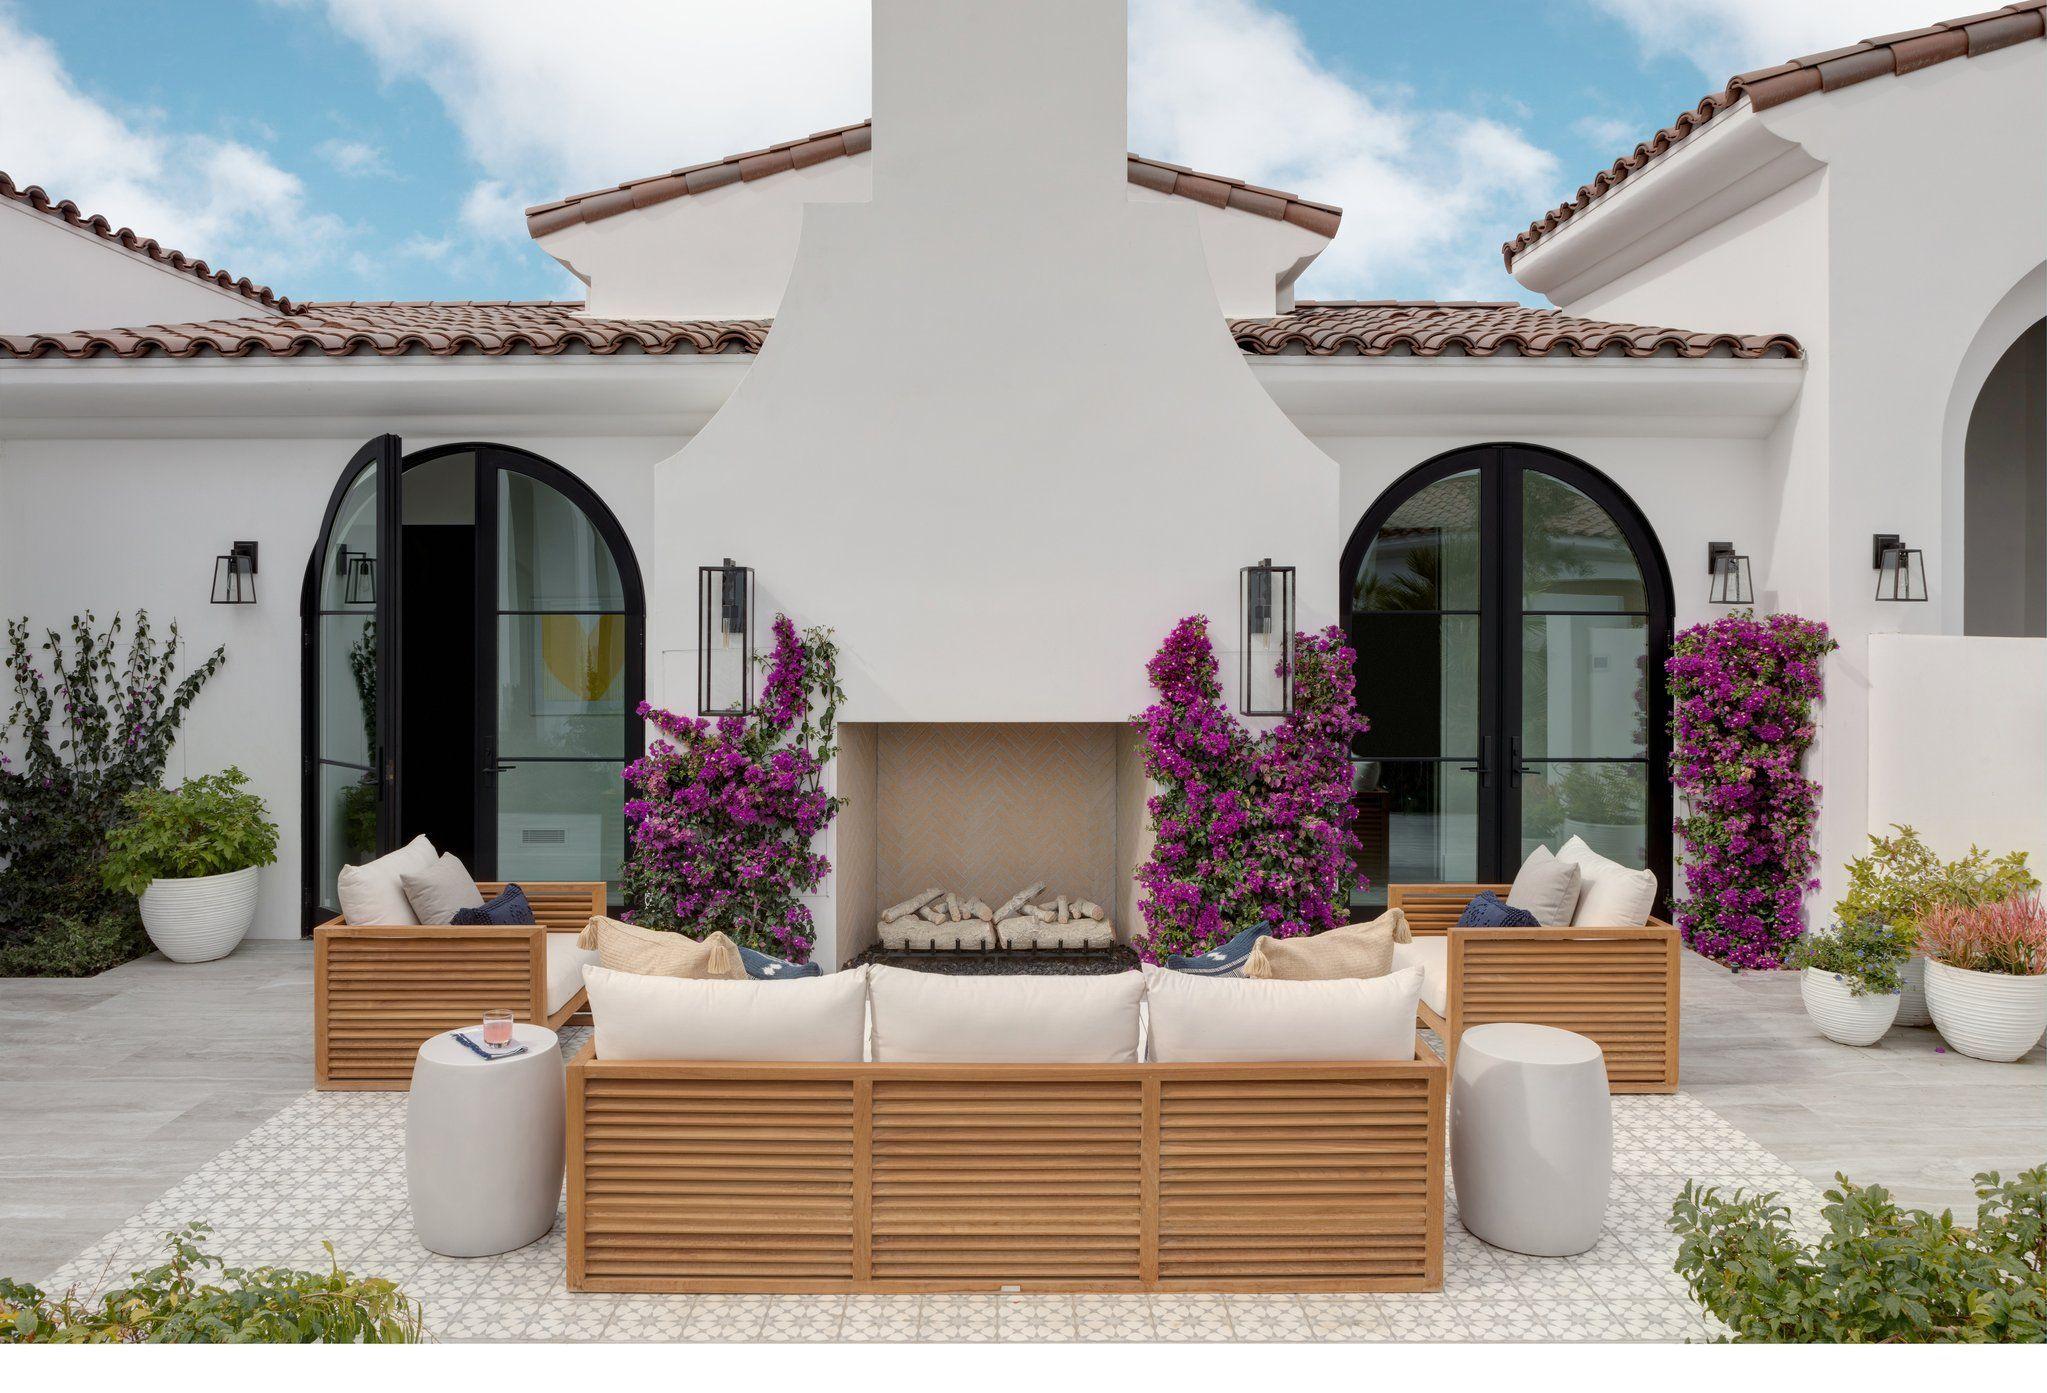 40 Best Patio Ideas For 2019 - Stylish Outdoor Patio Design Ideas